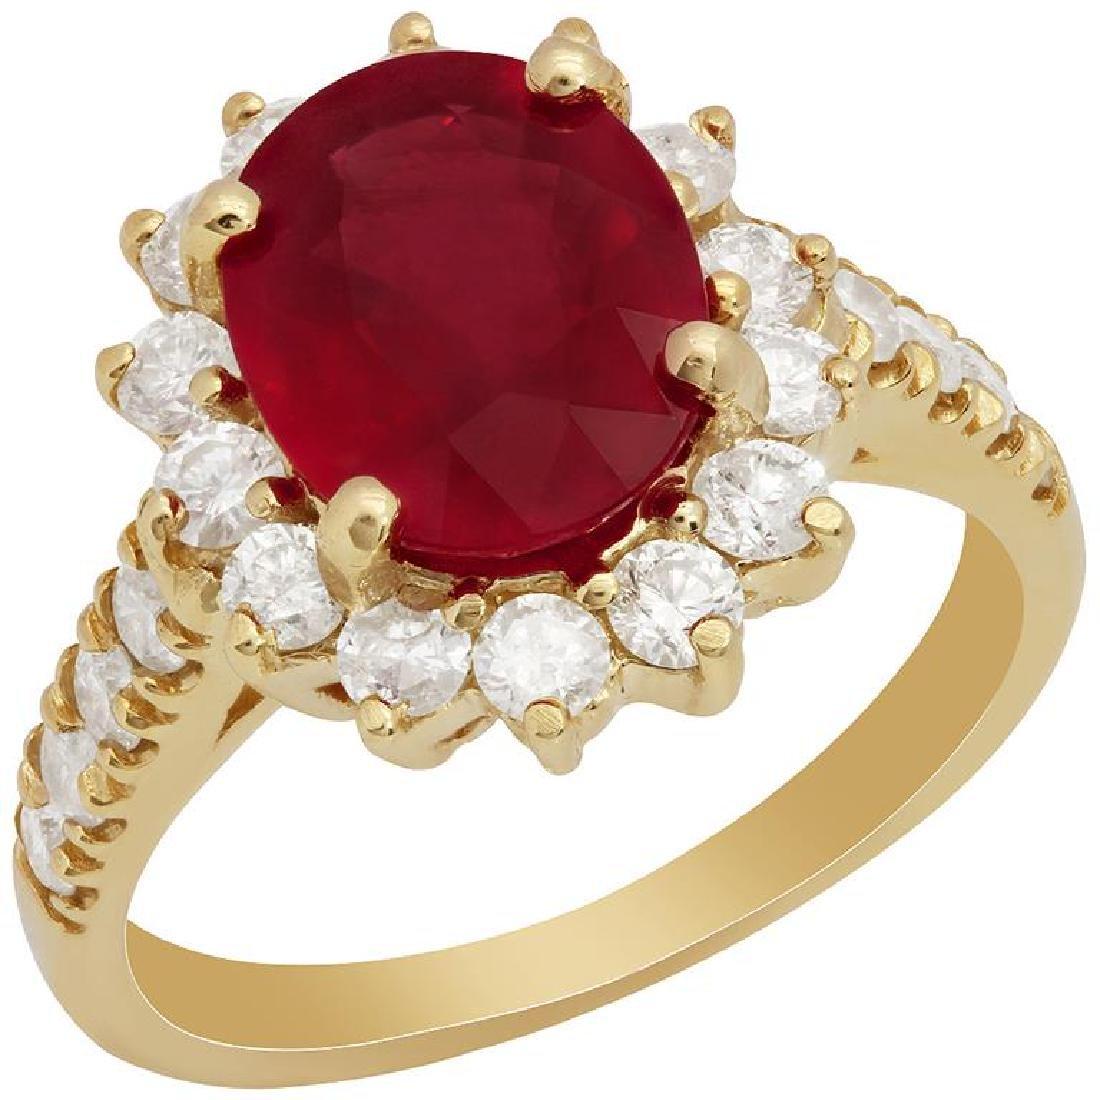 14k Yellow Gold 3.22ct Ruby 1.06ct Diamond Ring